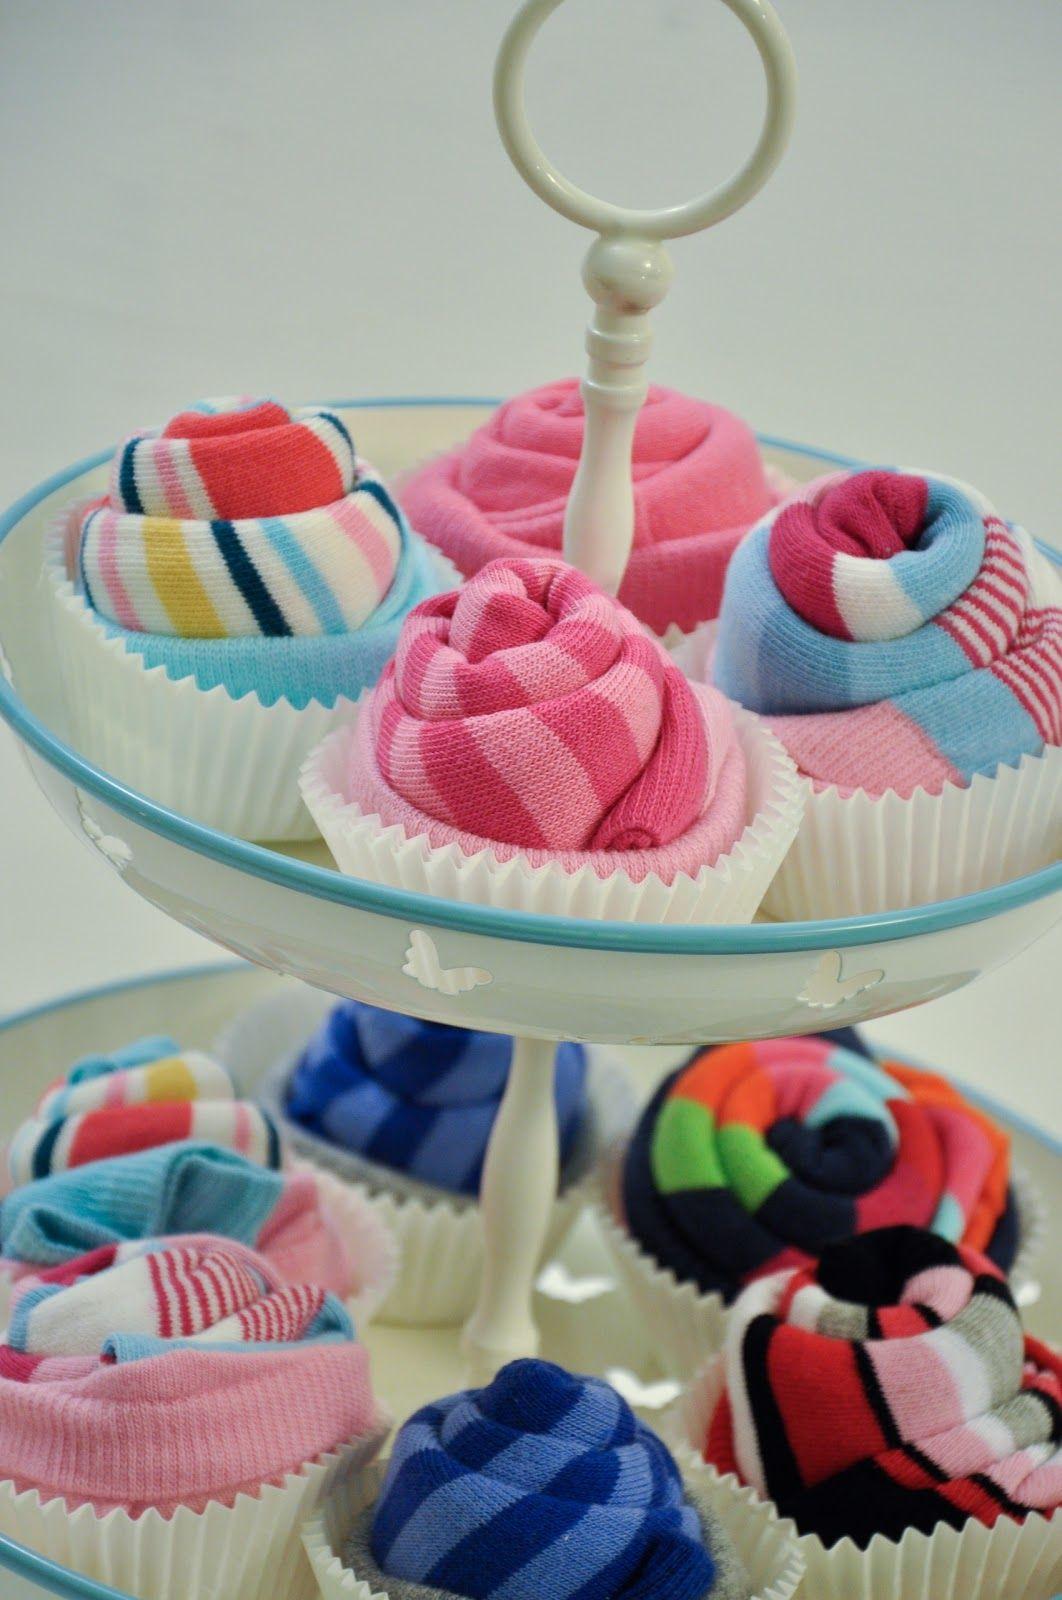 pippa's long stockings: DIY sock cupcakes